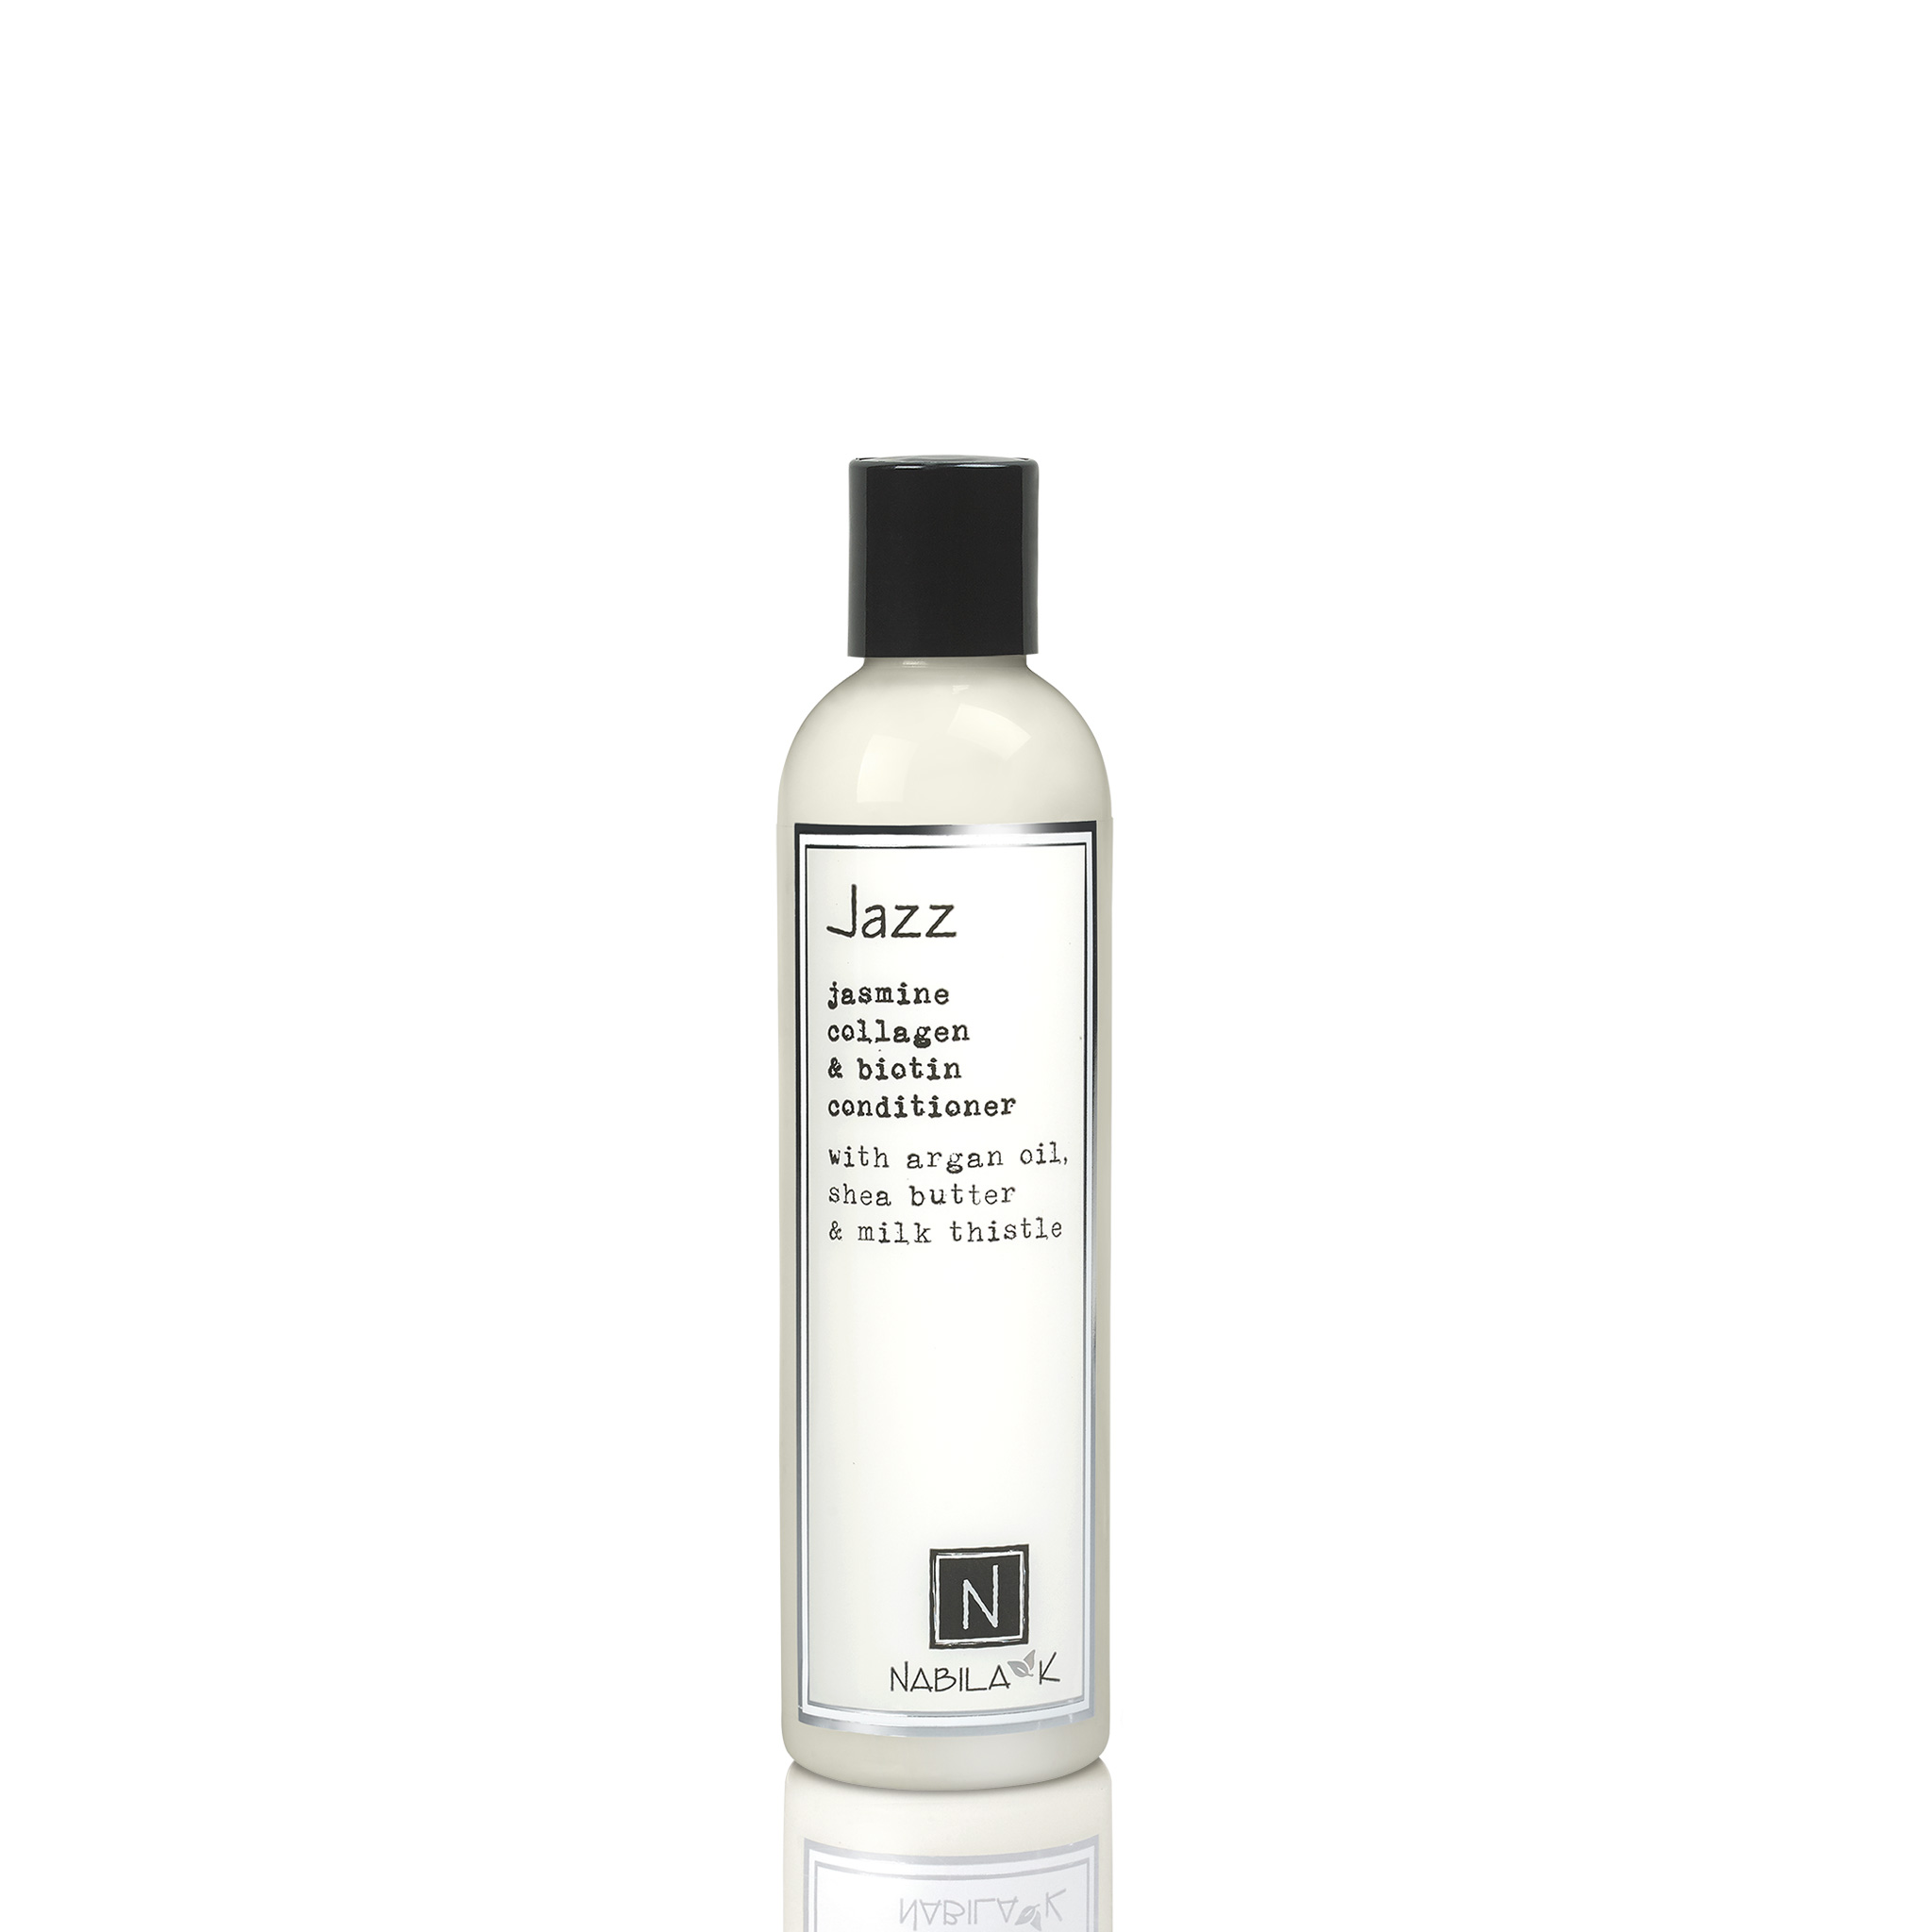 1 Large Sized Bottle of Jazz Jasmine Collagen and Biotin Conditioner